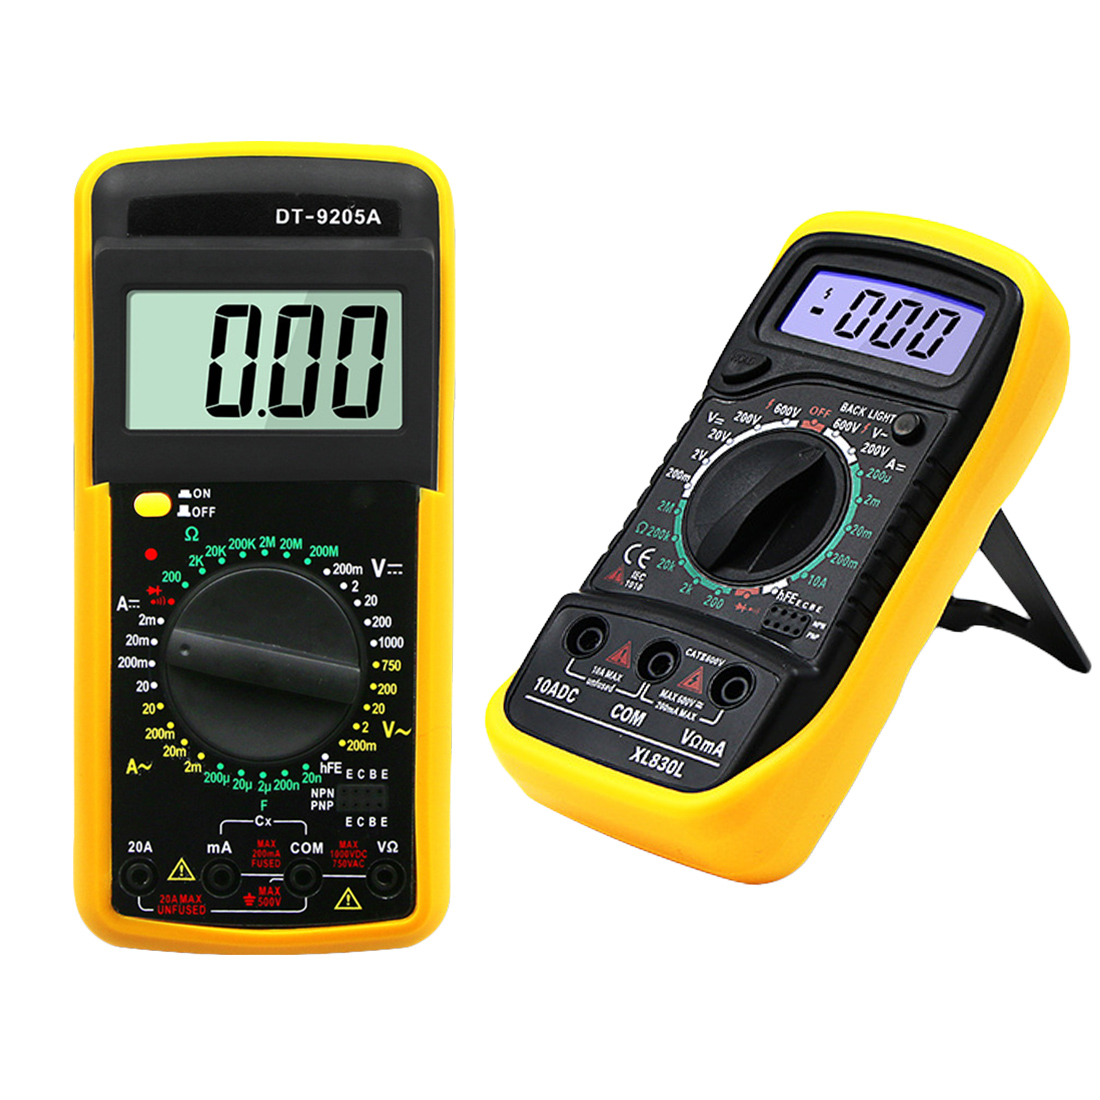 Kleine Haushalts Tragbare LCD Multimer Digital Multimeter Hintergrundbeleuchtung AC/DC Amperemeter Voltmeter Ohm Tester Meter Hohe Präzision